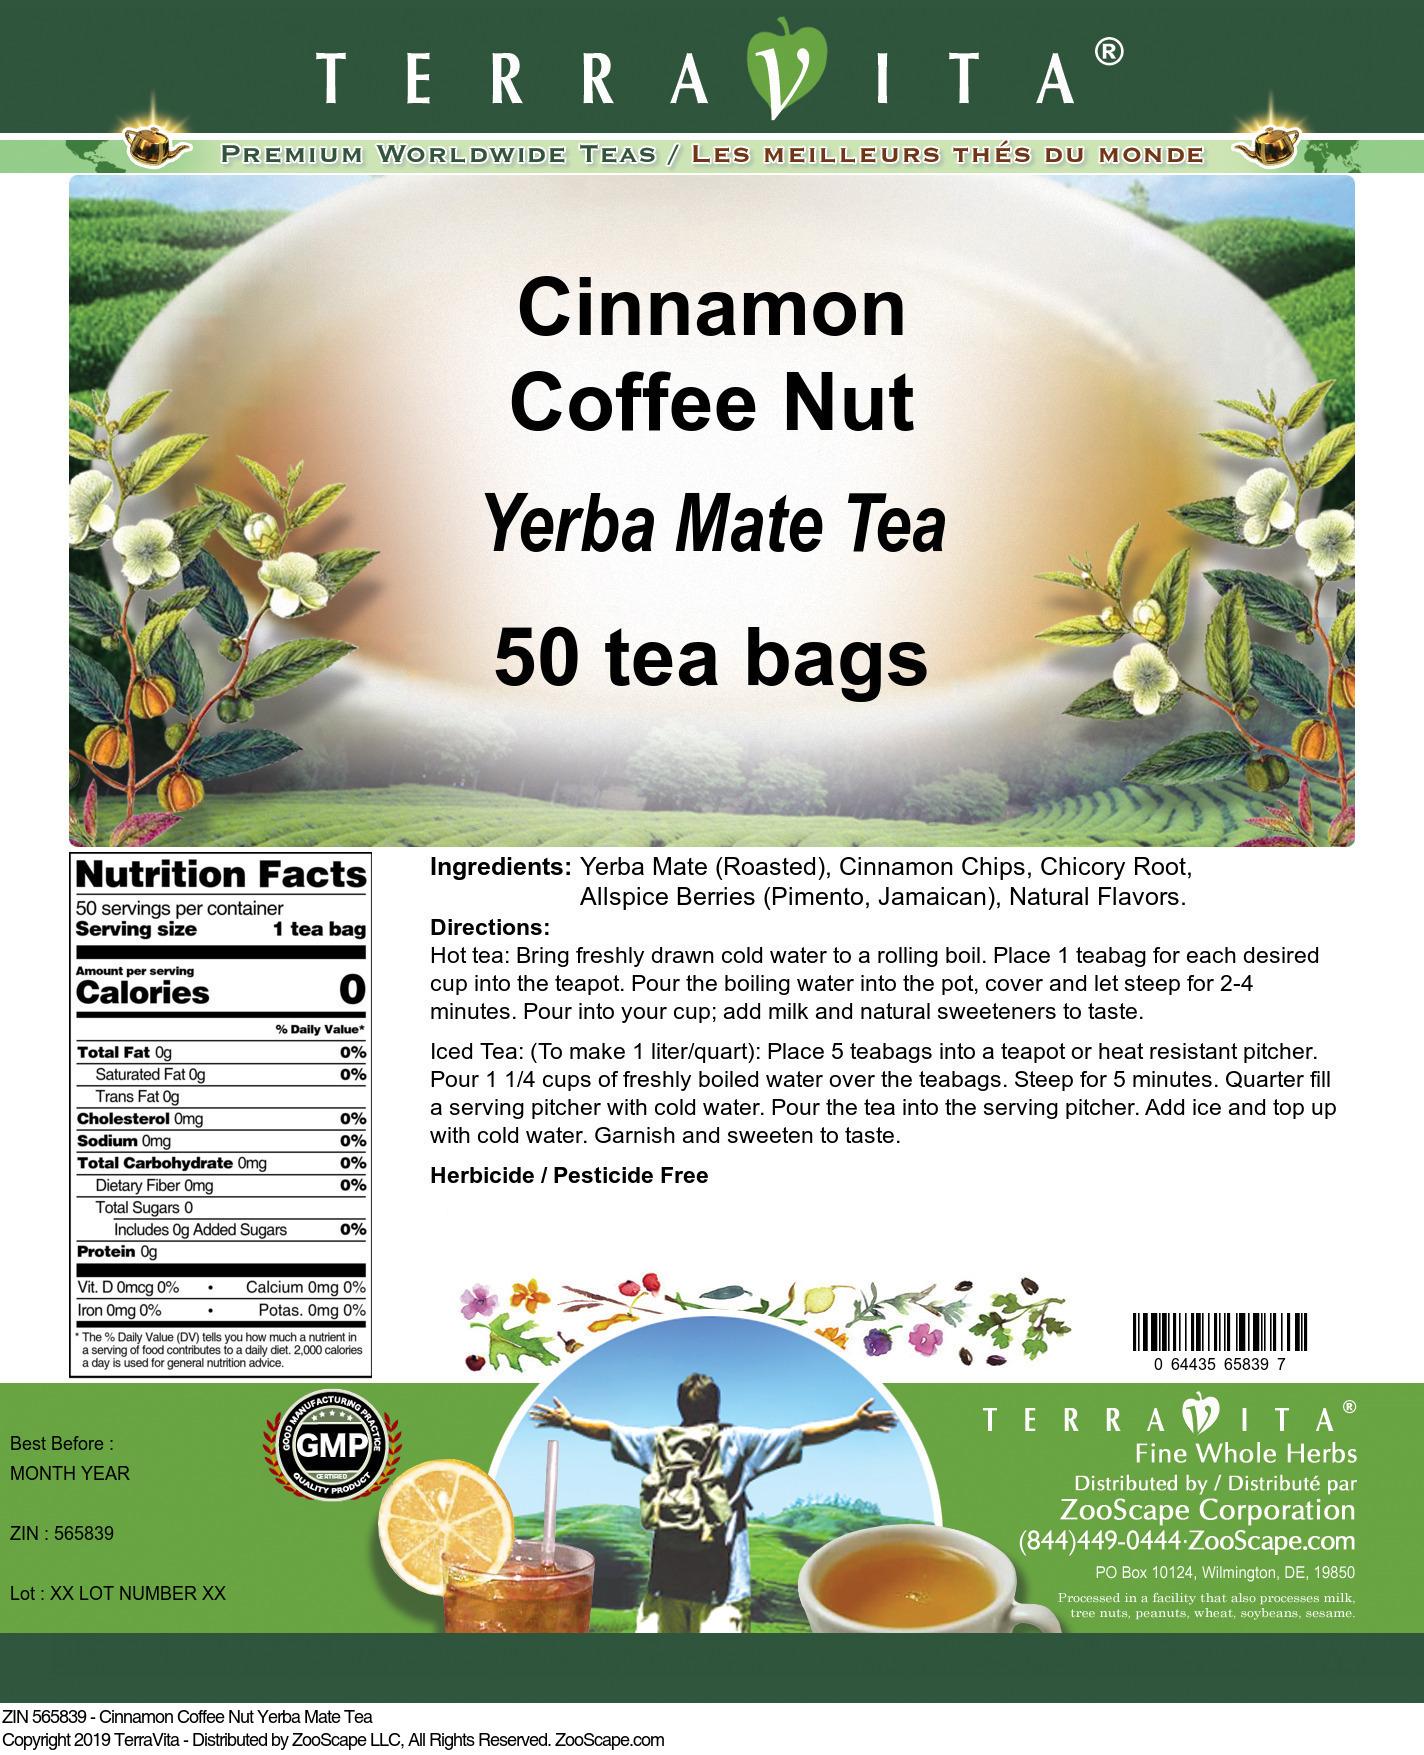 Cinnamon Coffee Nut Yerba Mate